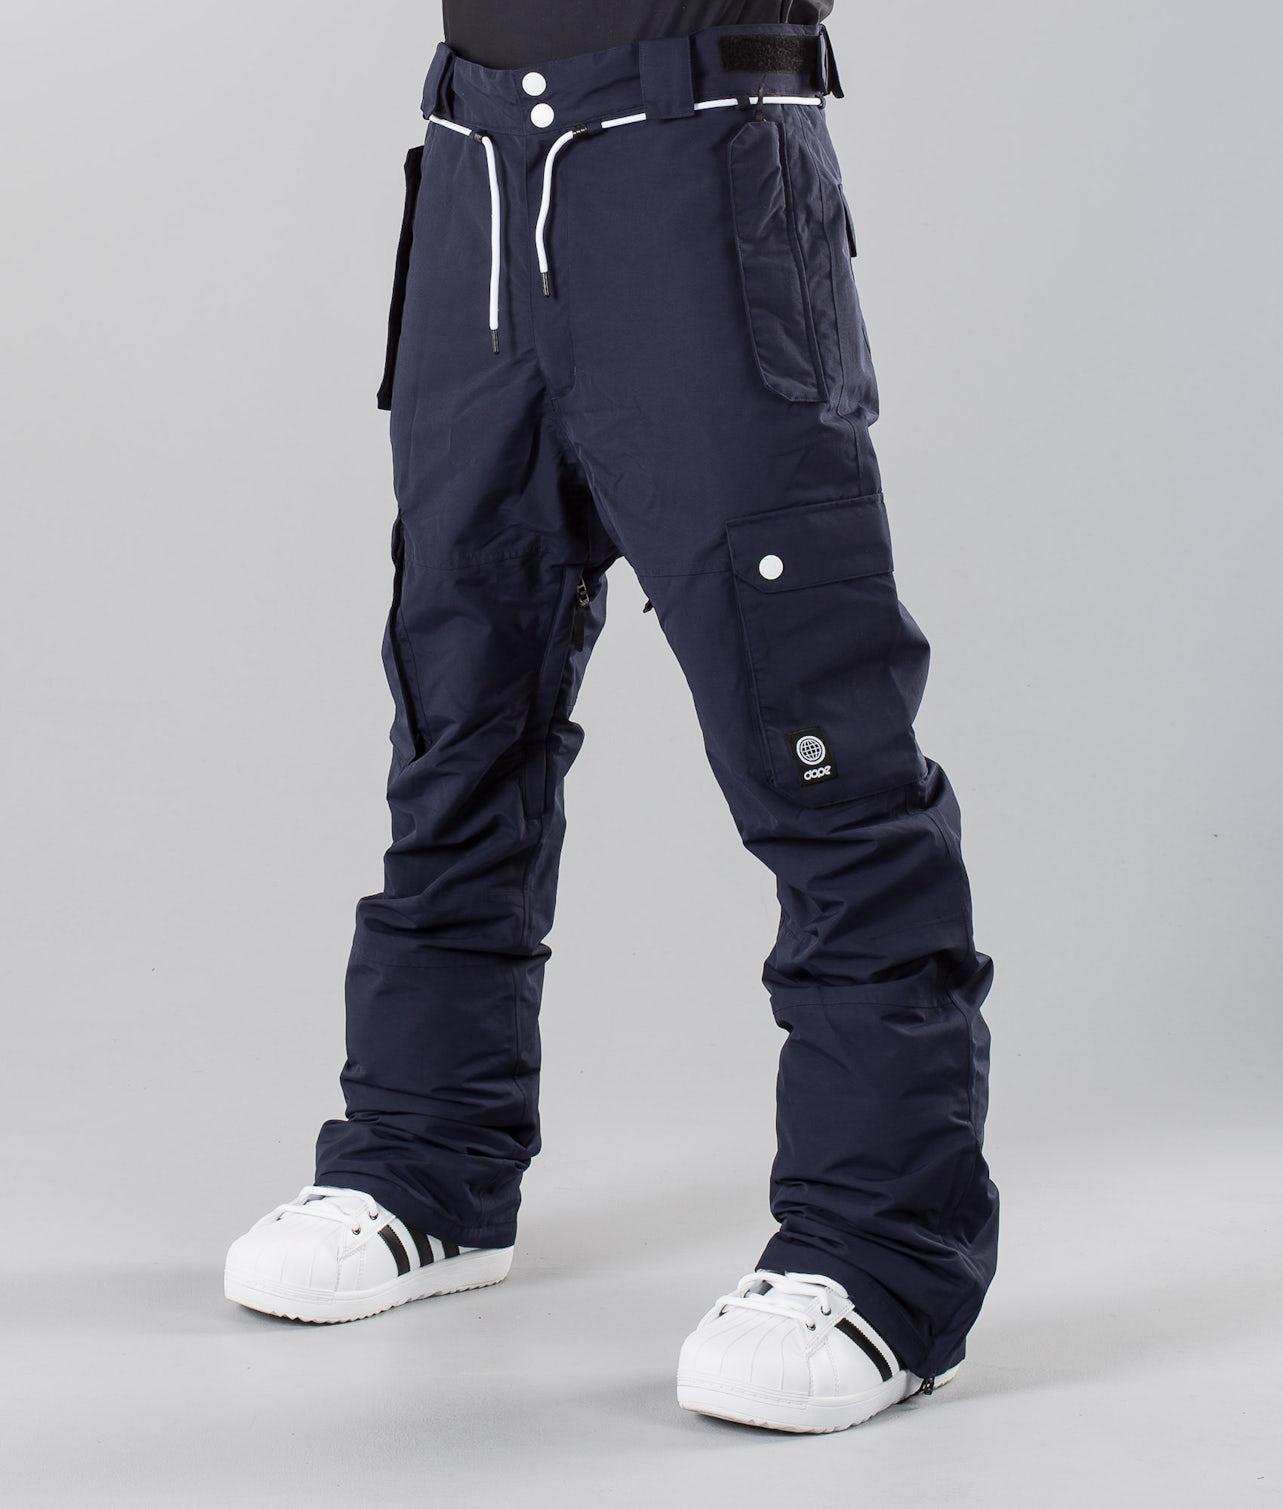 Dope Iconic 18 Pantalones de nieve Marine